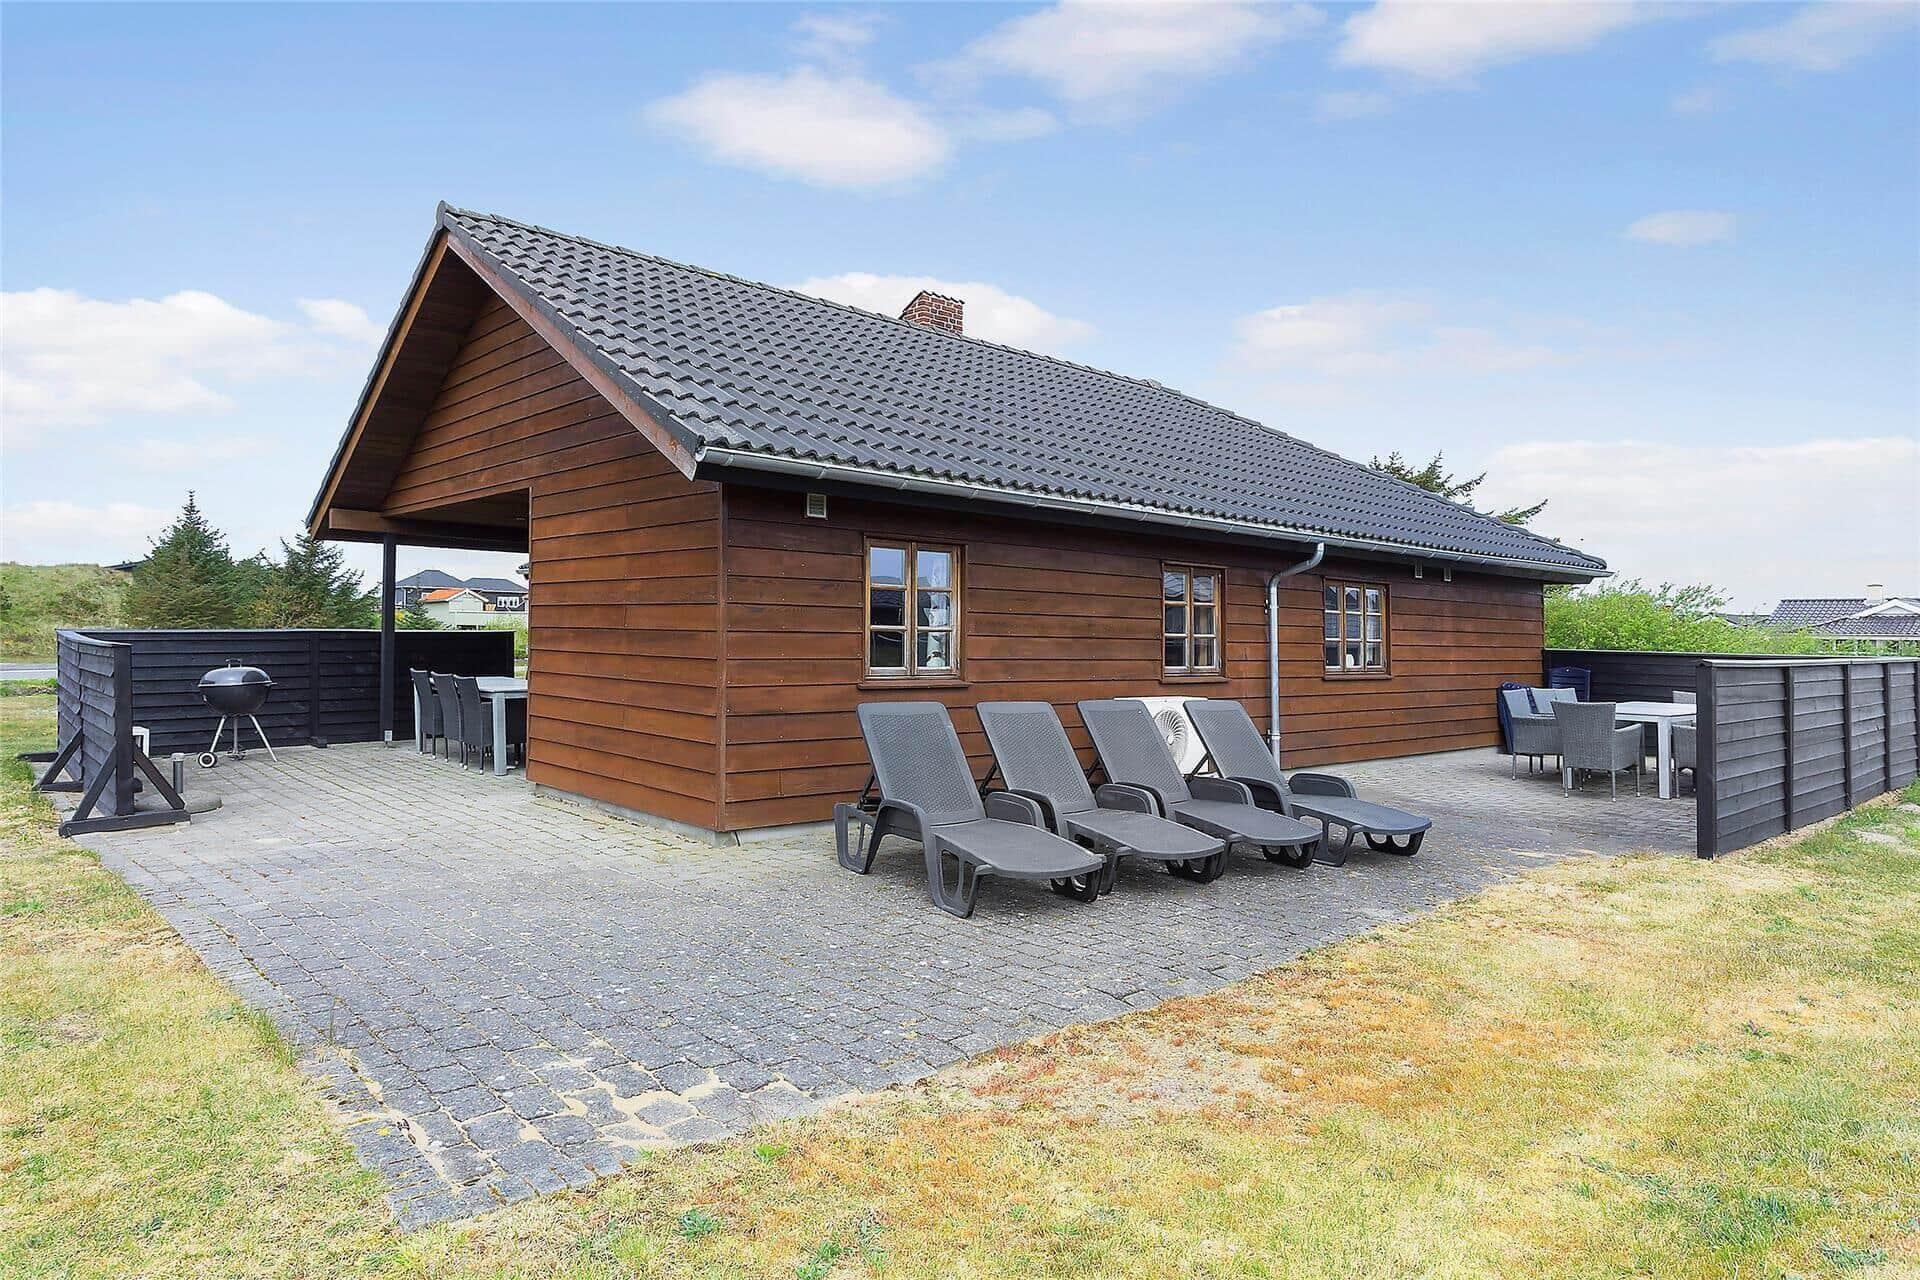 Image 1-11 Holiday-home 0126, Lakolk 201, DK - 6792 Rømø